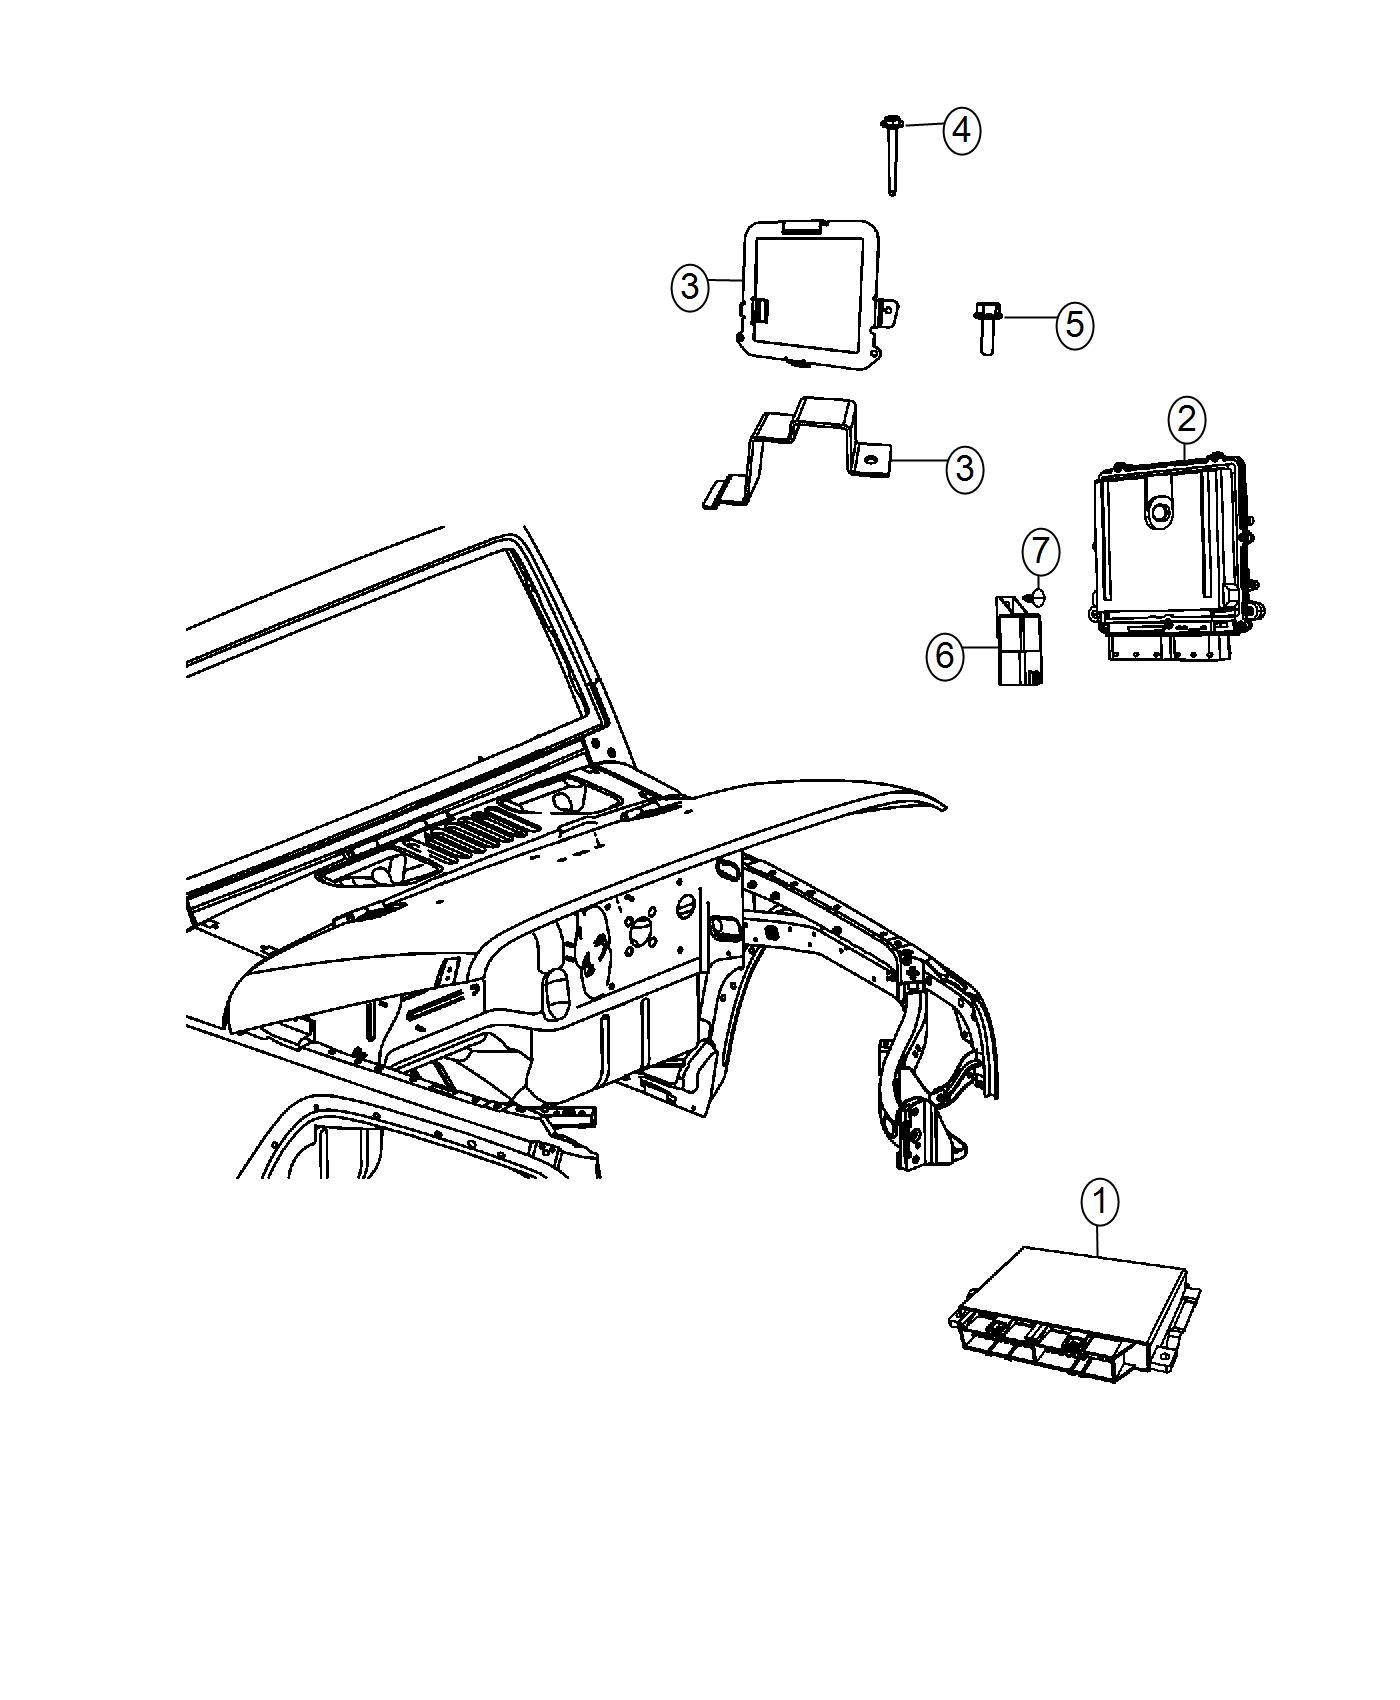 Jeep Wrangler Module Glow Plug Modules Compartment